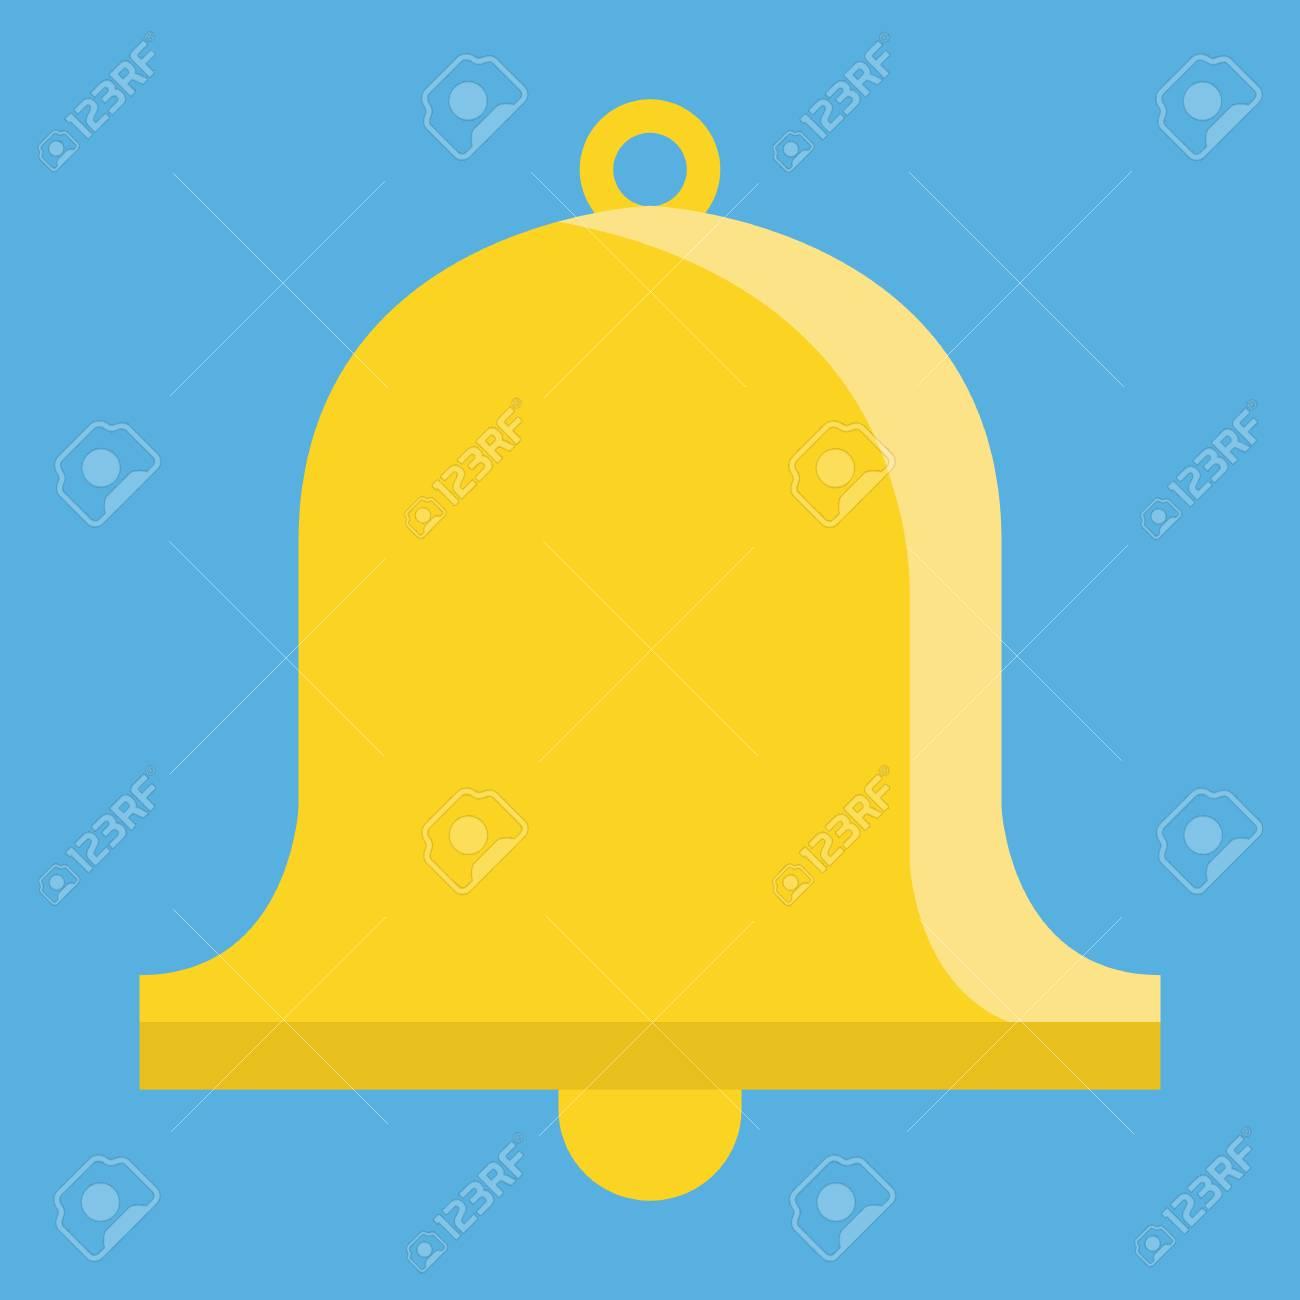 Vector Bell Icon Stock Vector - 26453470